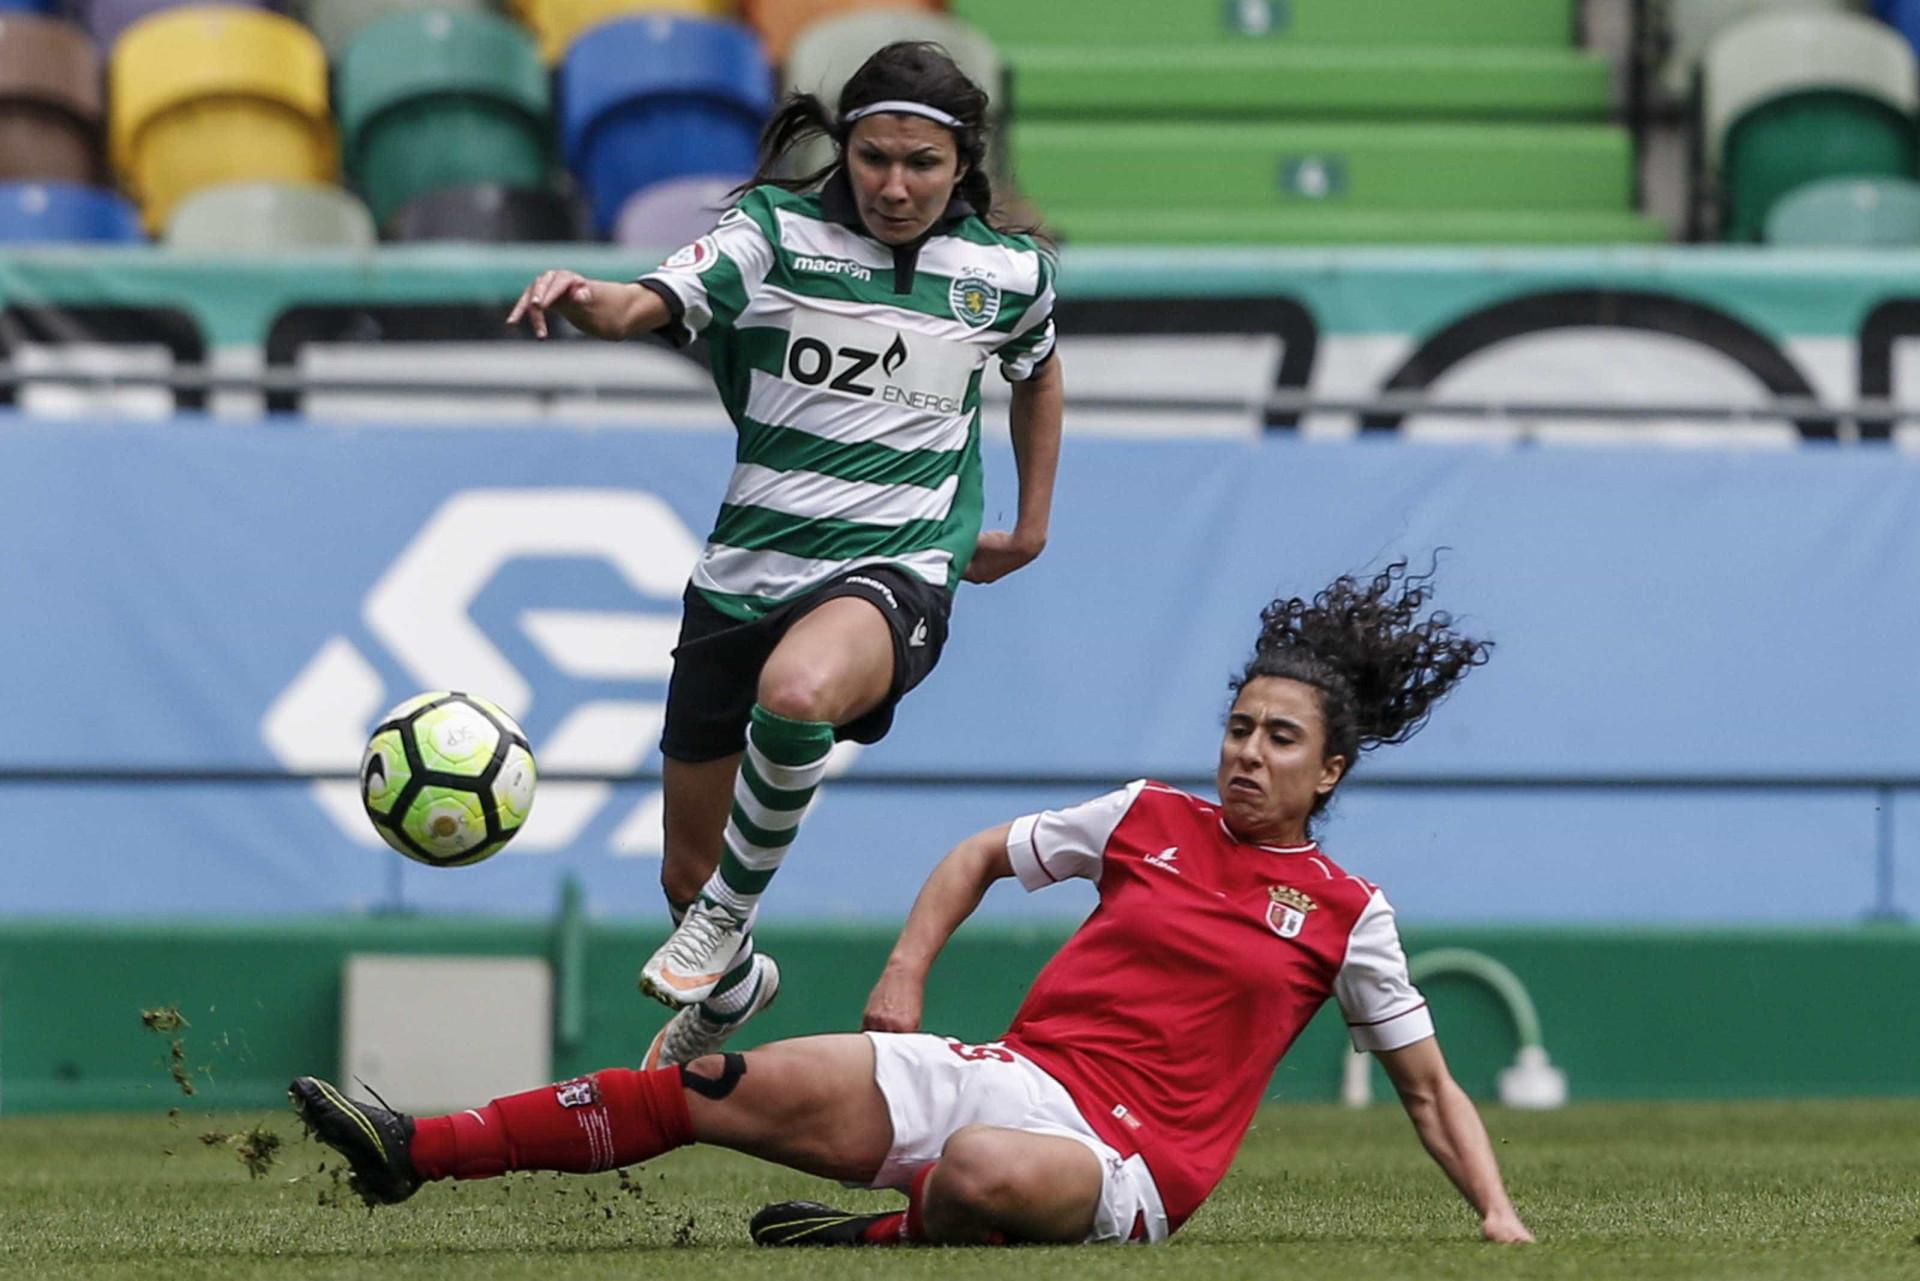 Ana Borges, Laura Luís e Rute Costa premiadas